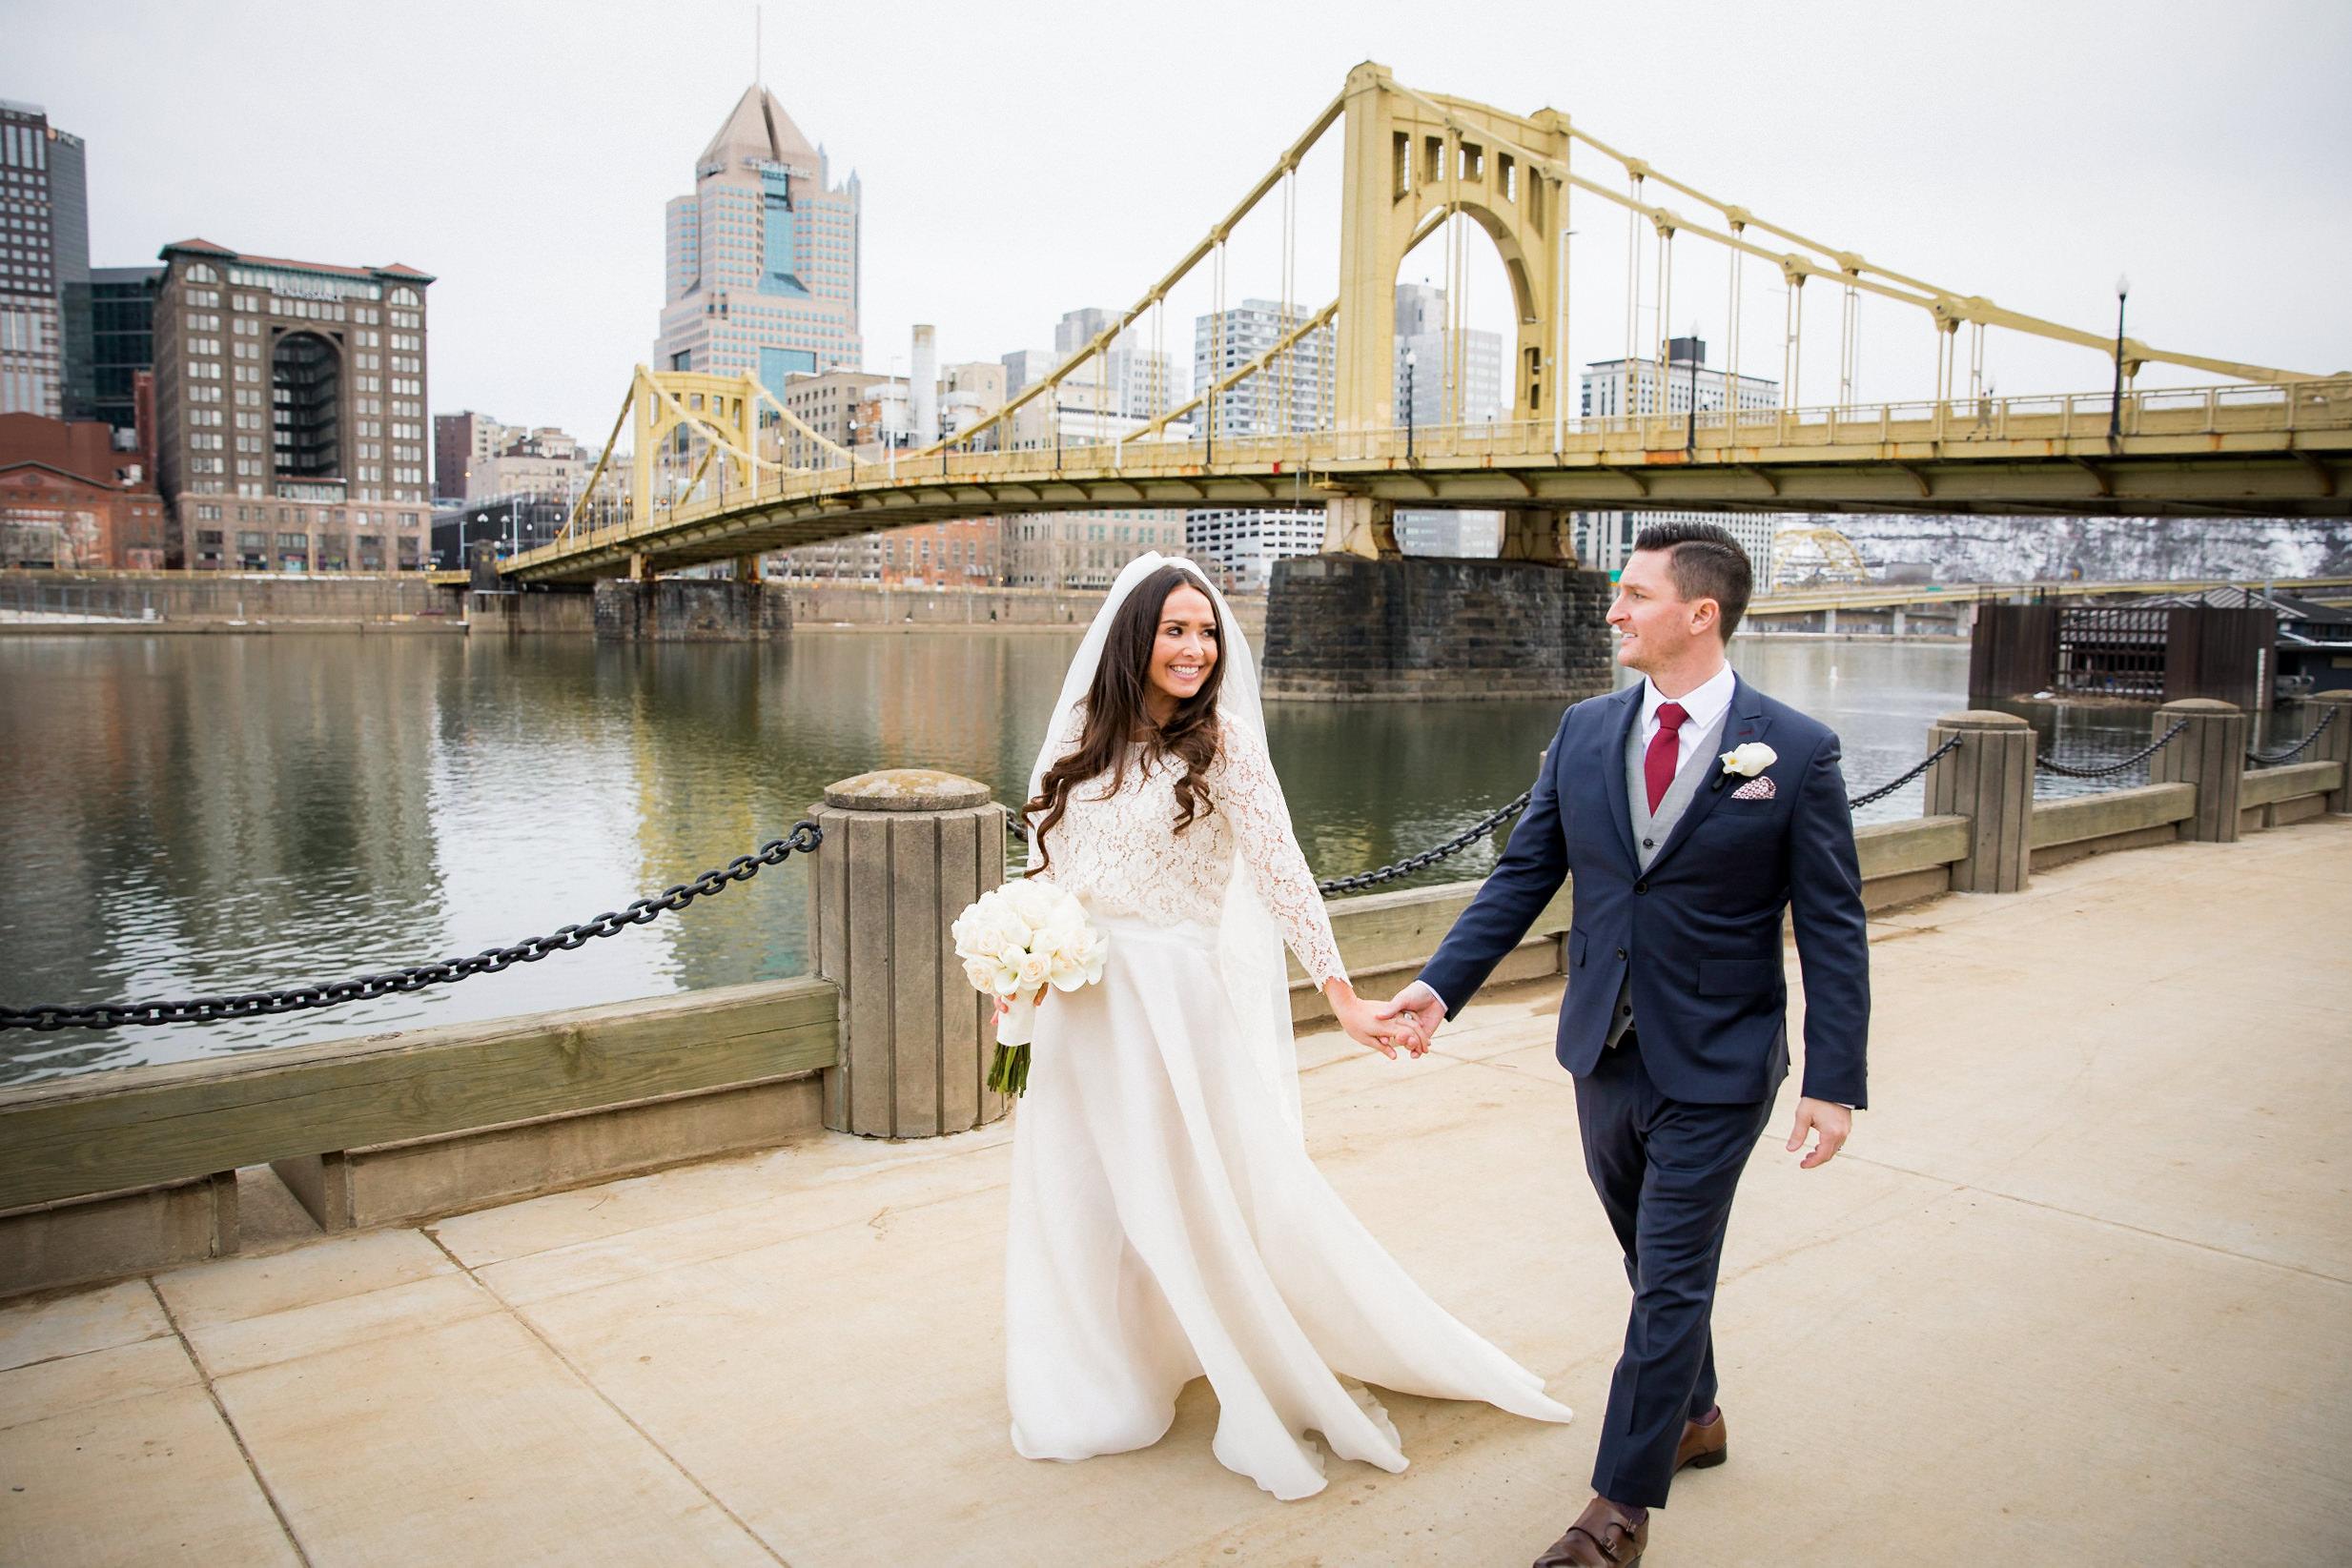 North Shore Clemente Bridge Wedding Engagement Picture Locations-3.jpg